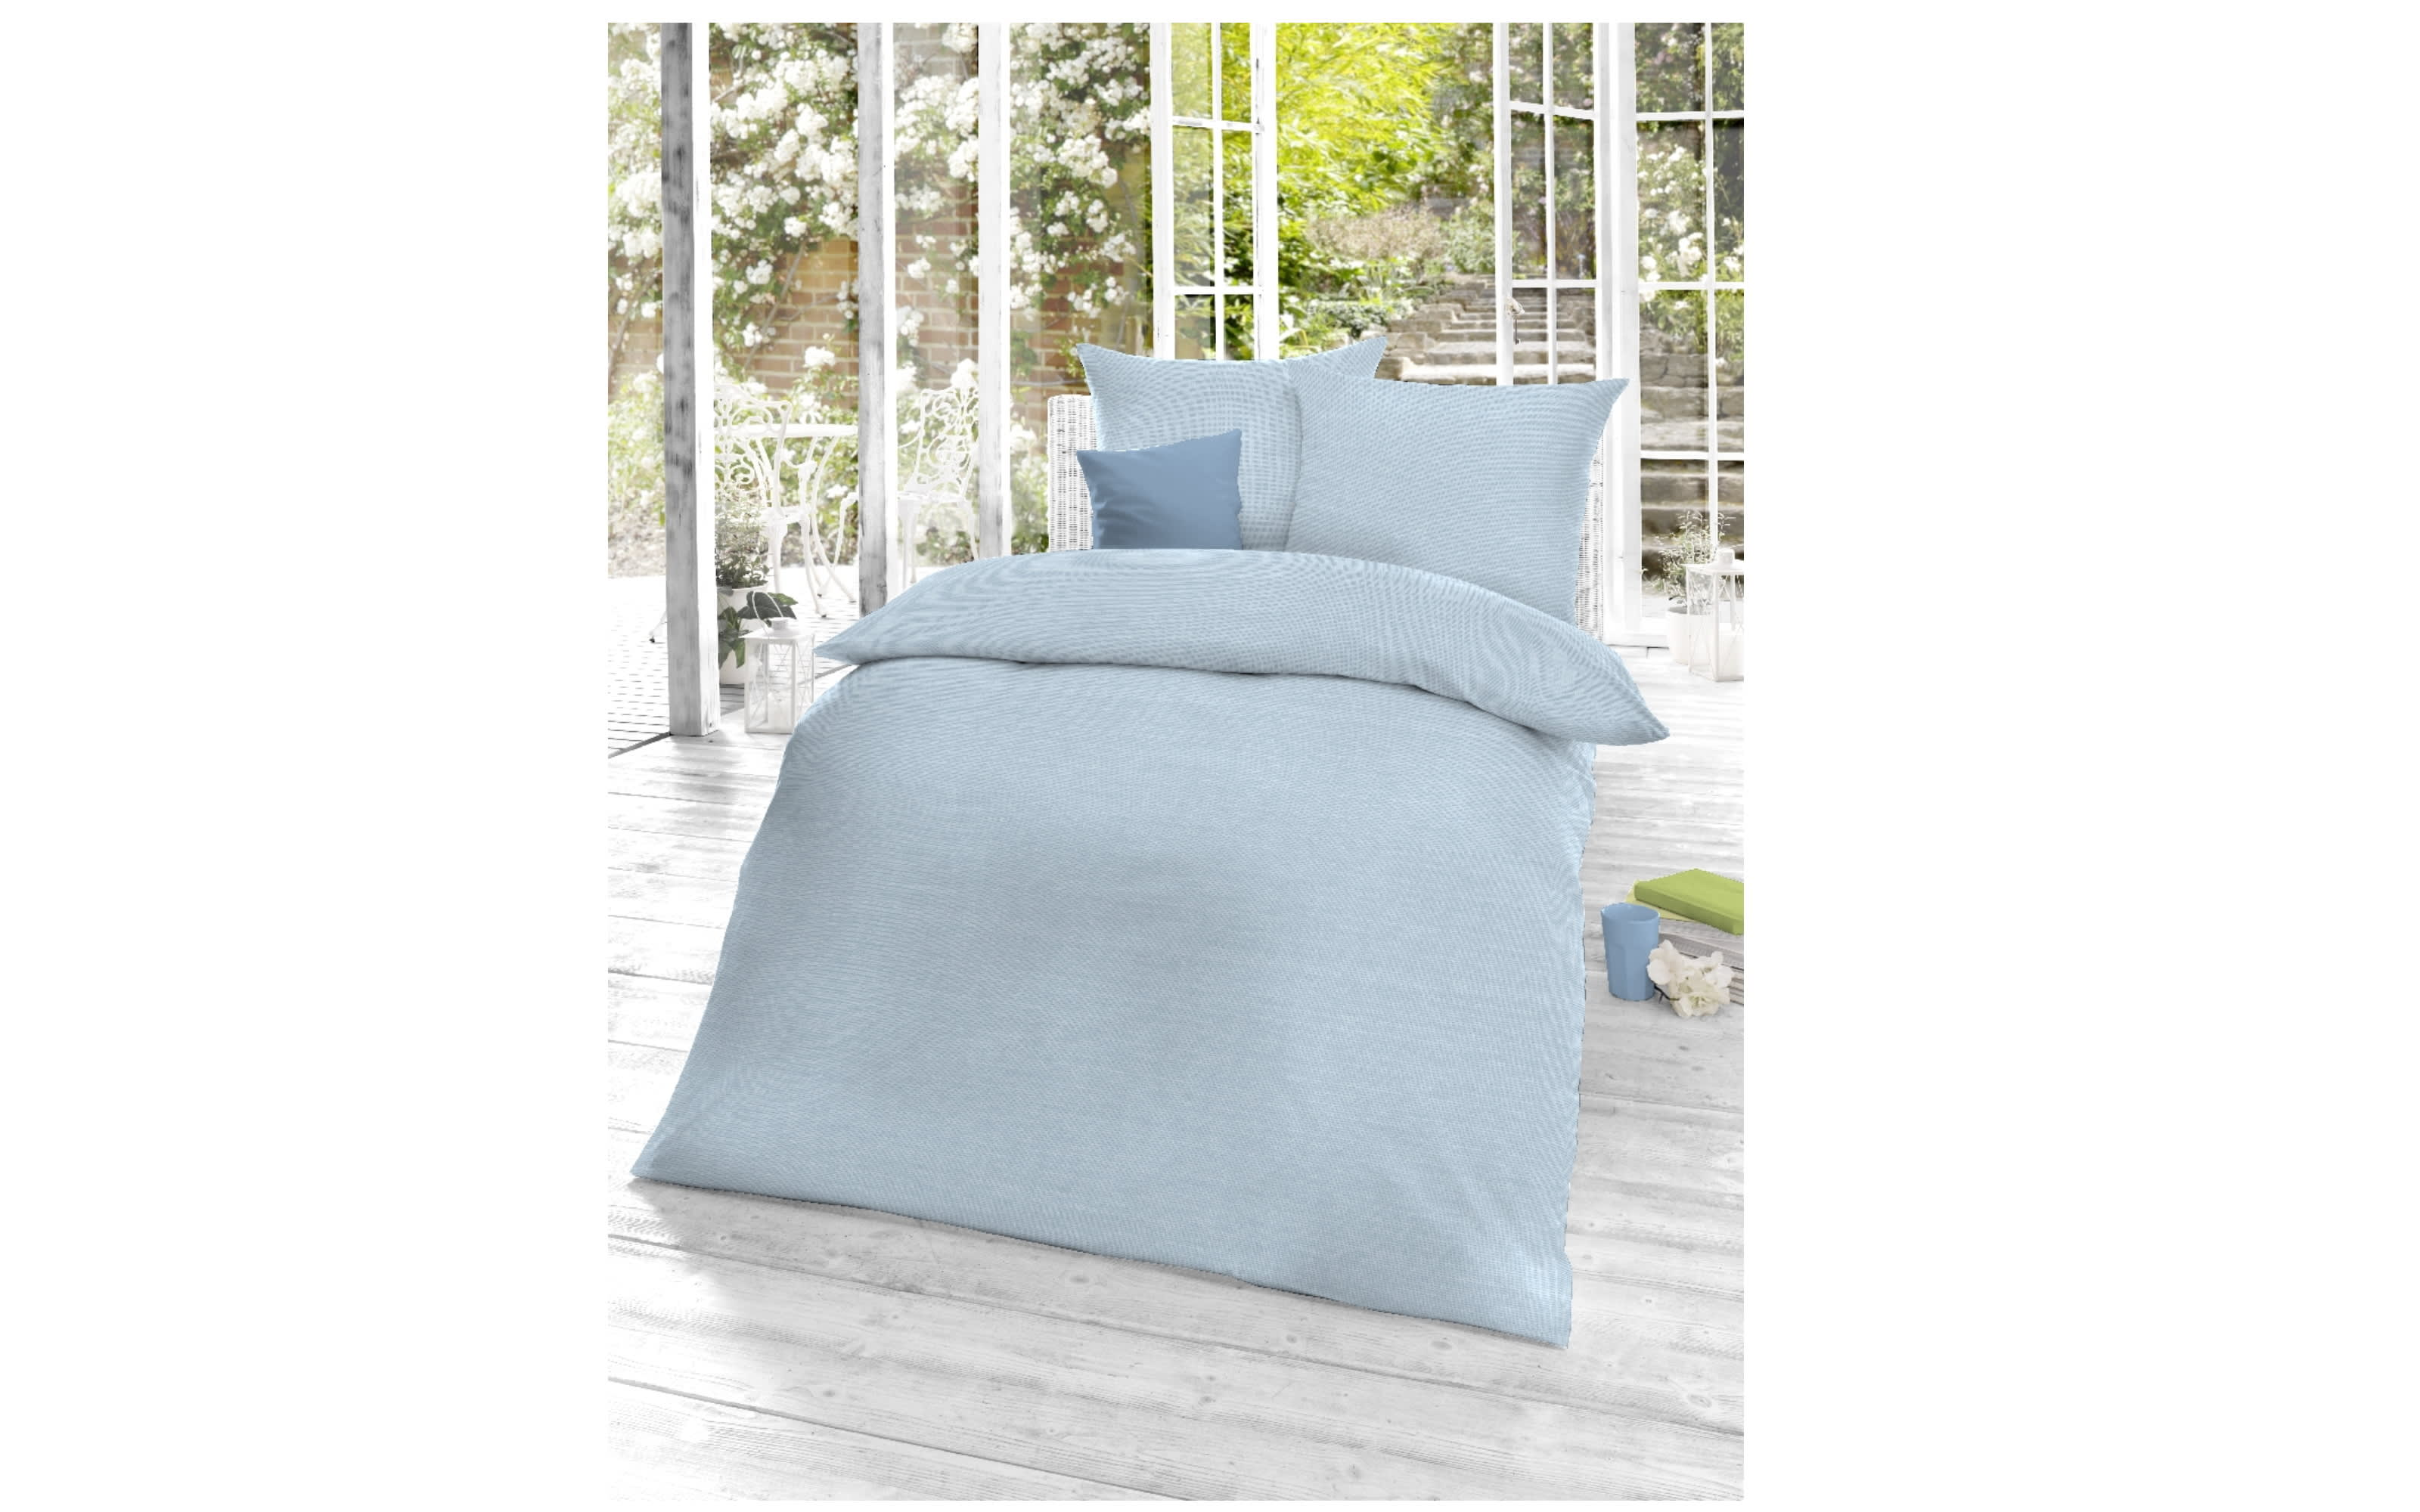 Bettwäsche Mako Satin Select in angle blue, 155 x 220 cm